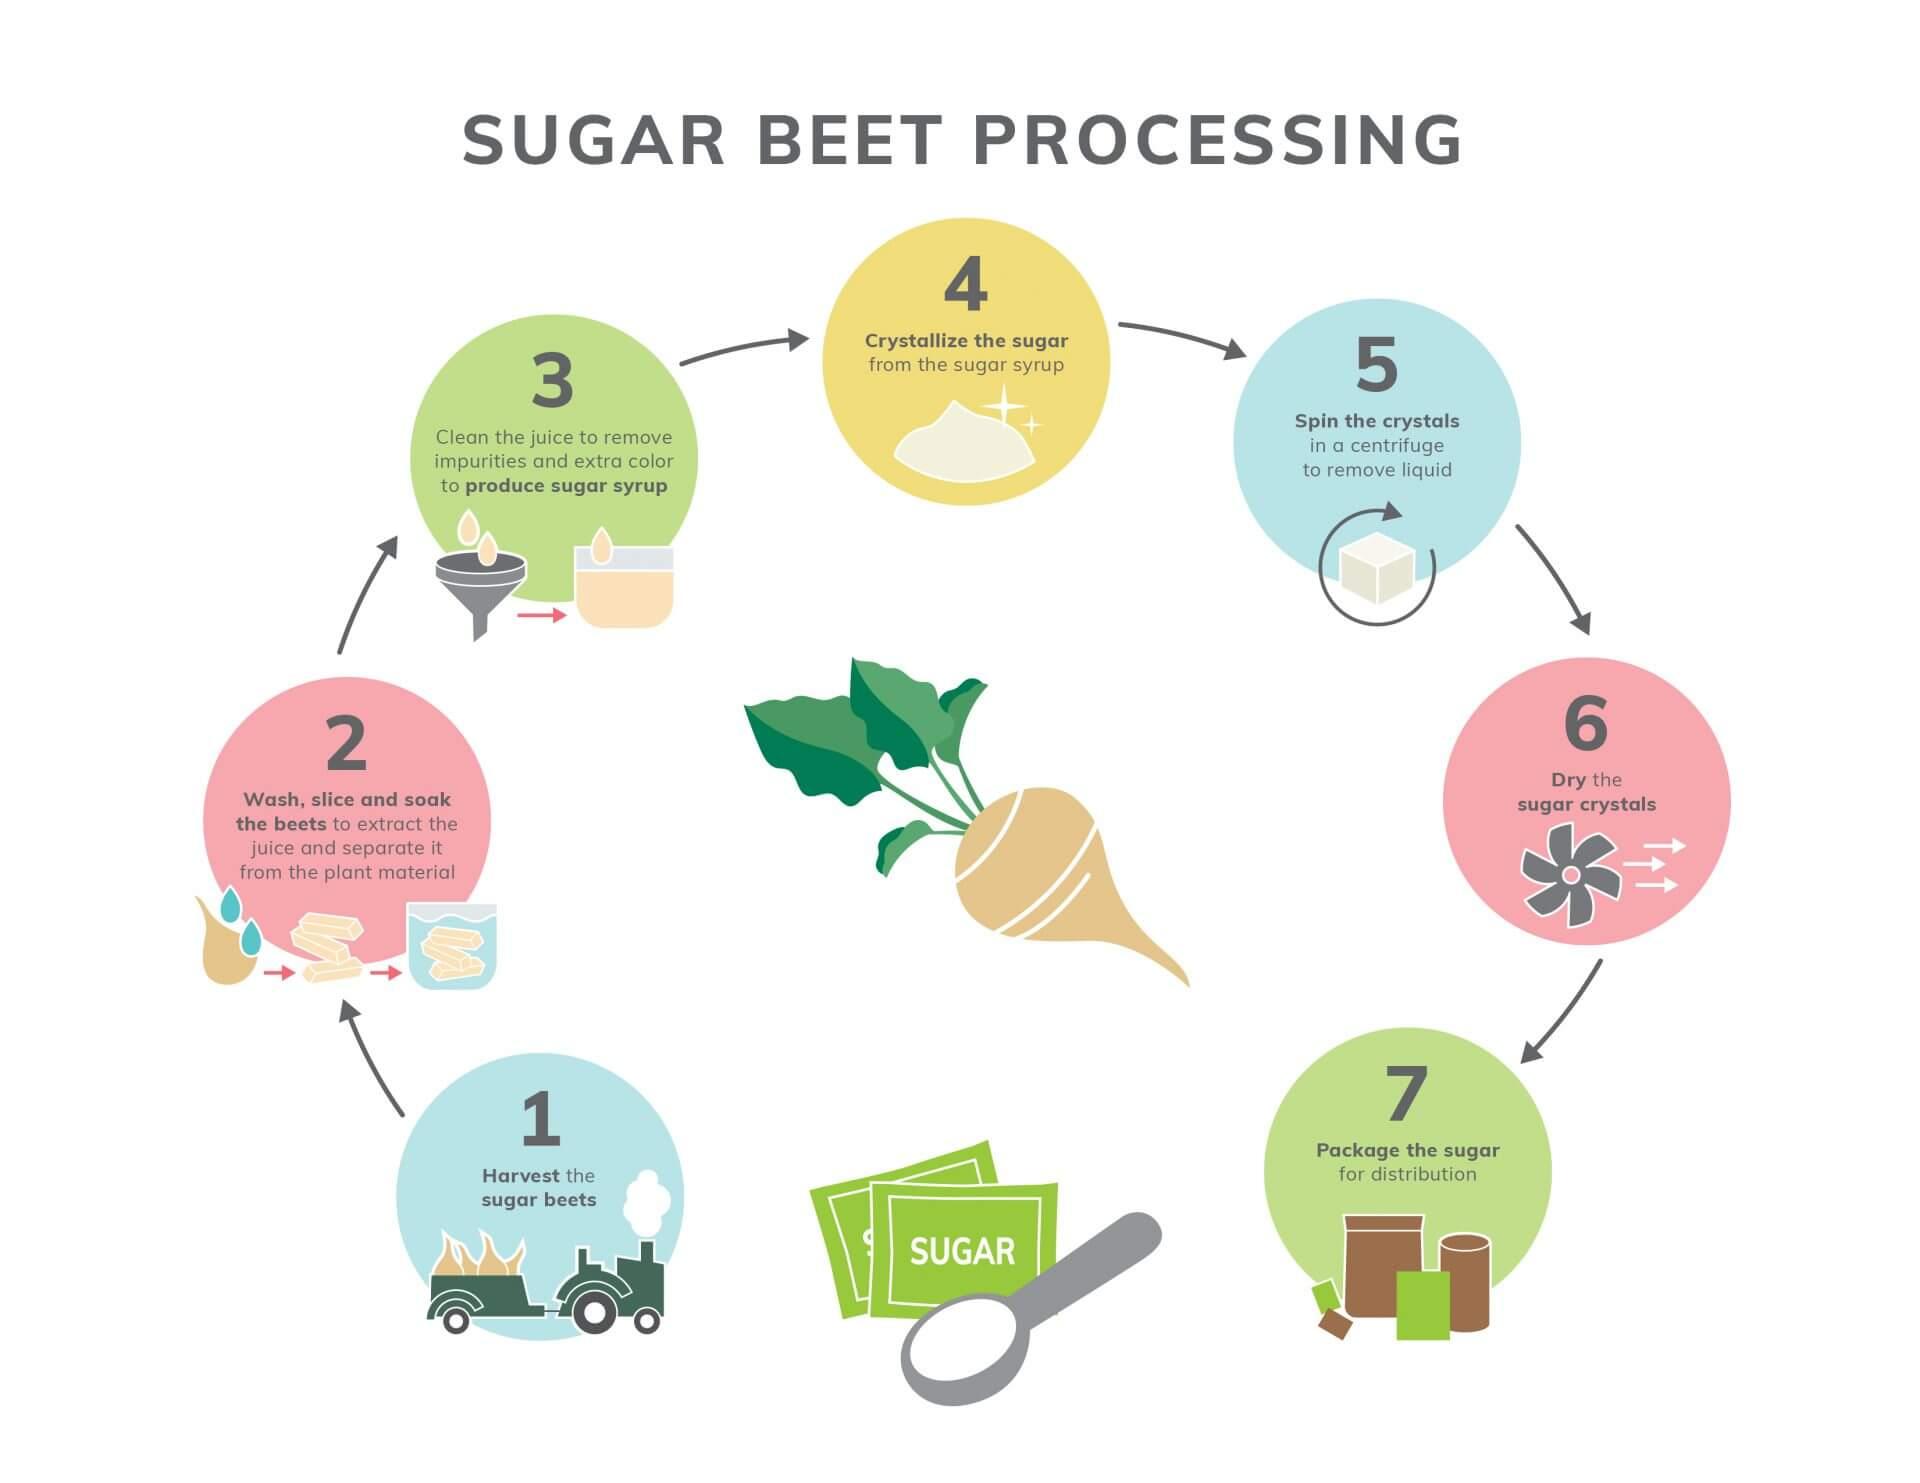 Sugar Beet Processing Infographic